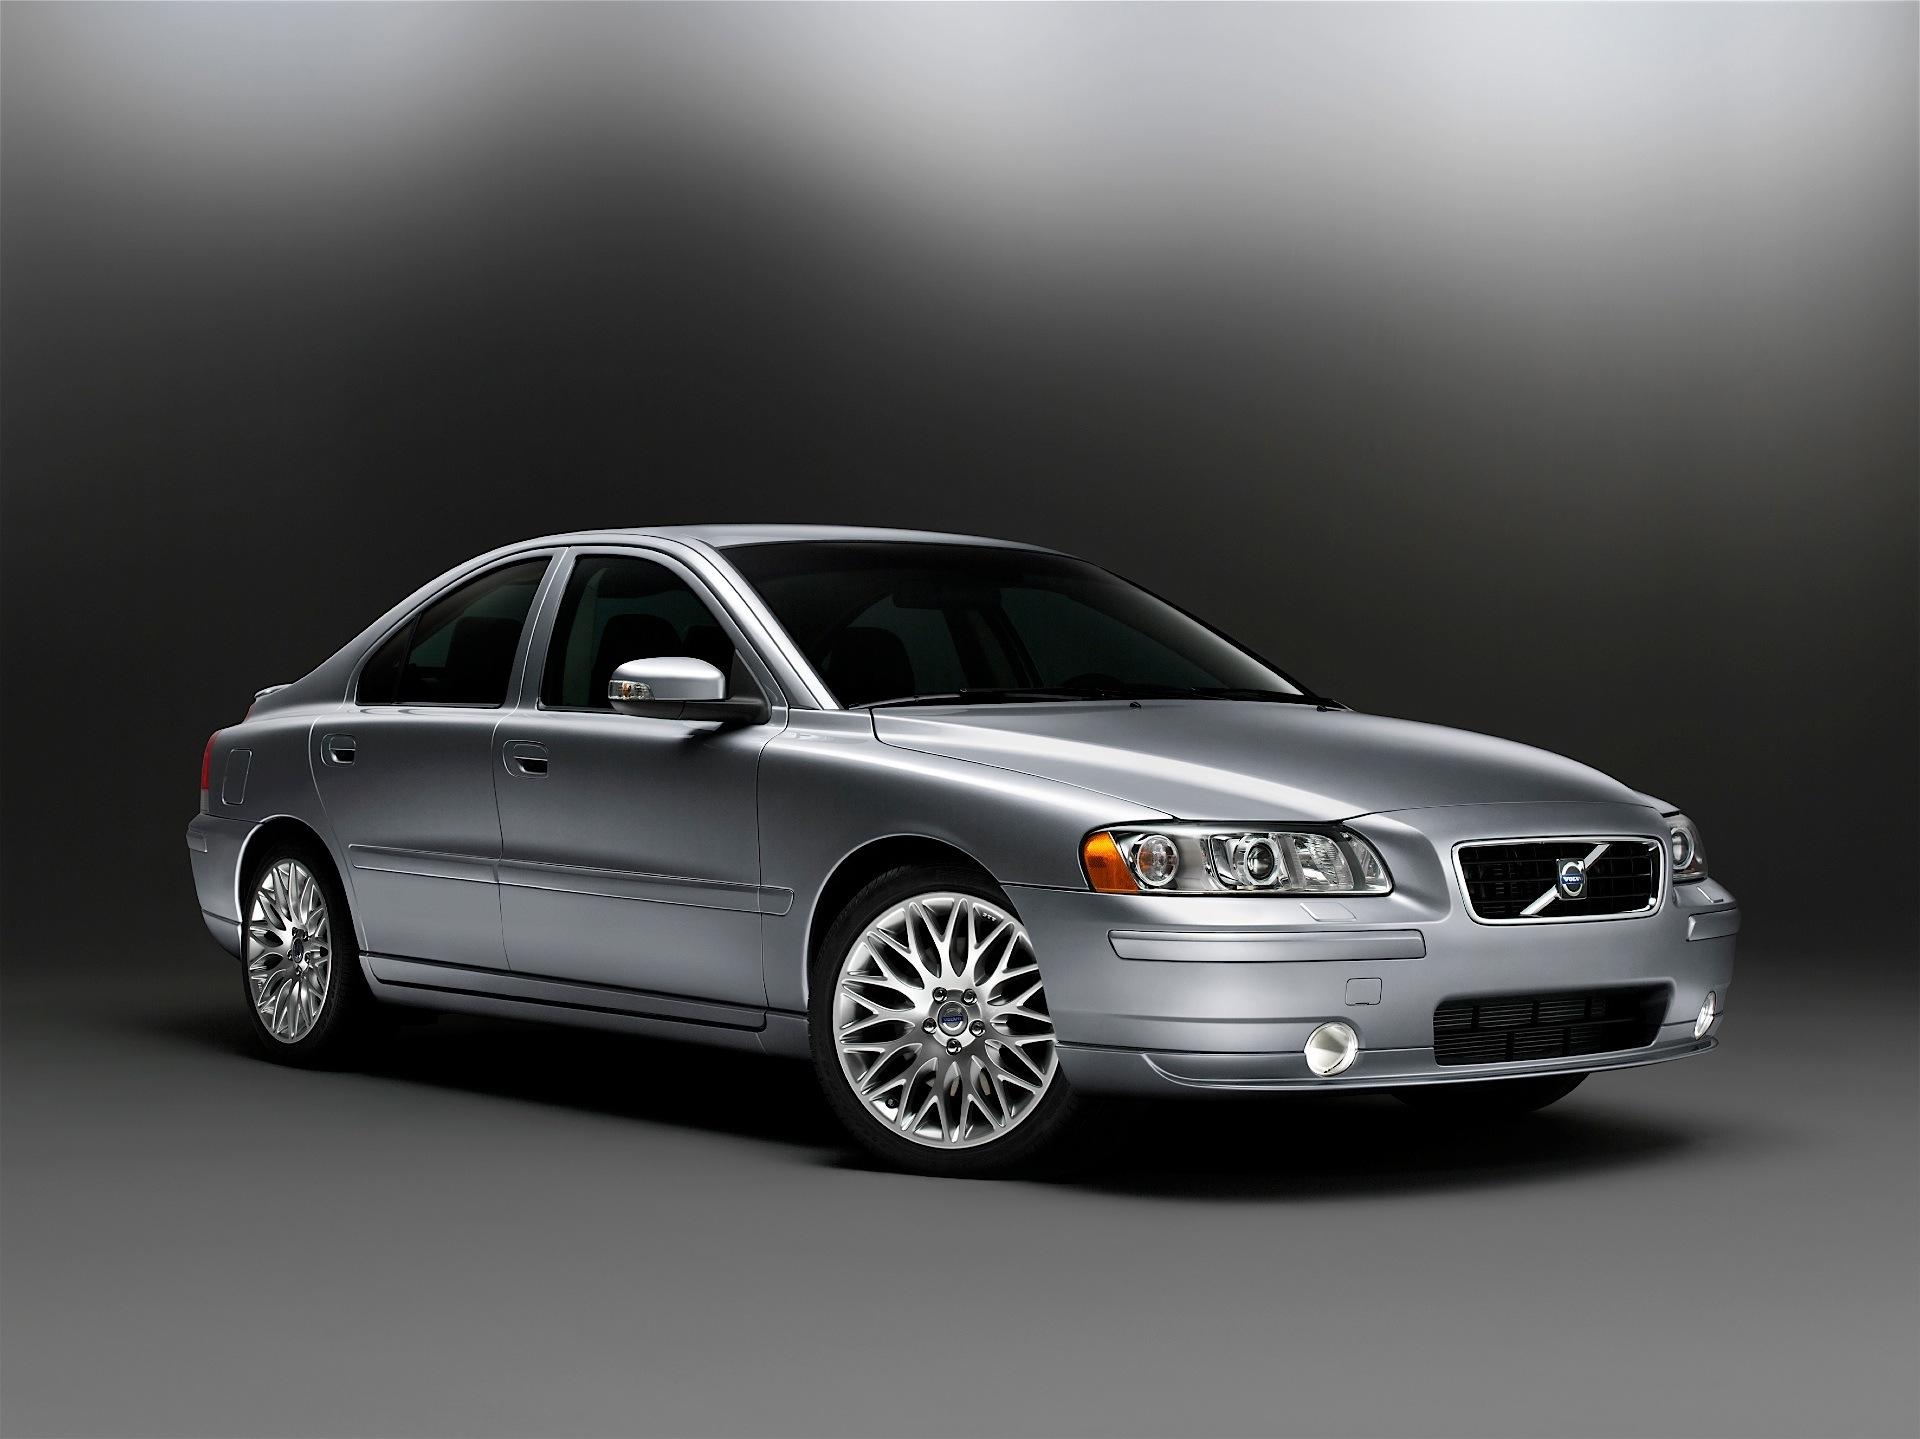 VOLVO S60 - 2008, 2009, 2010 - autoevolution